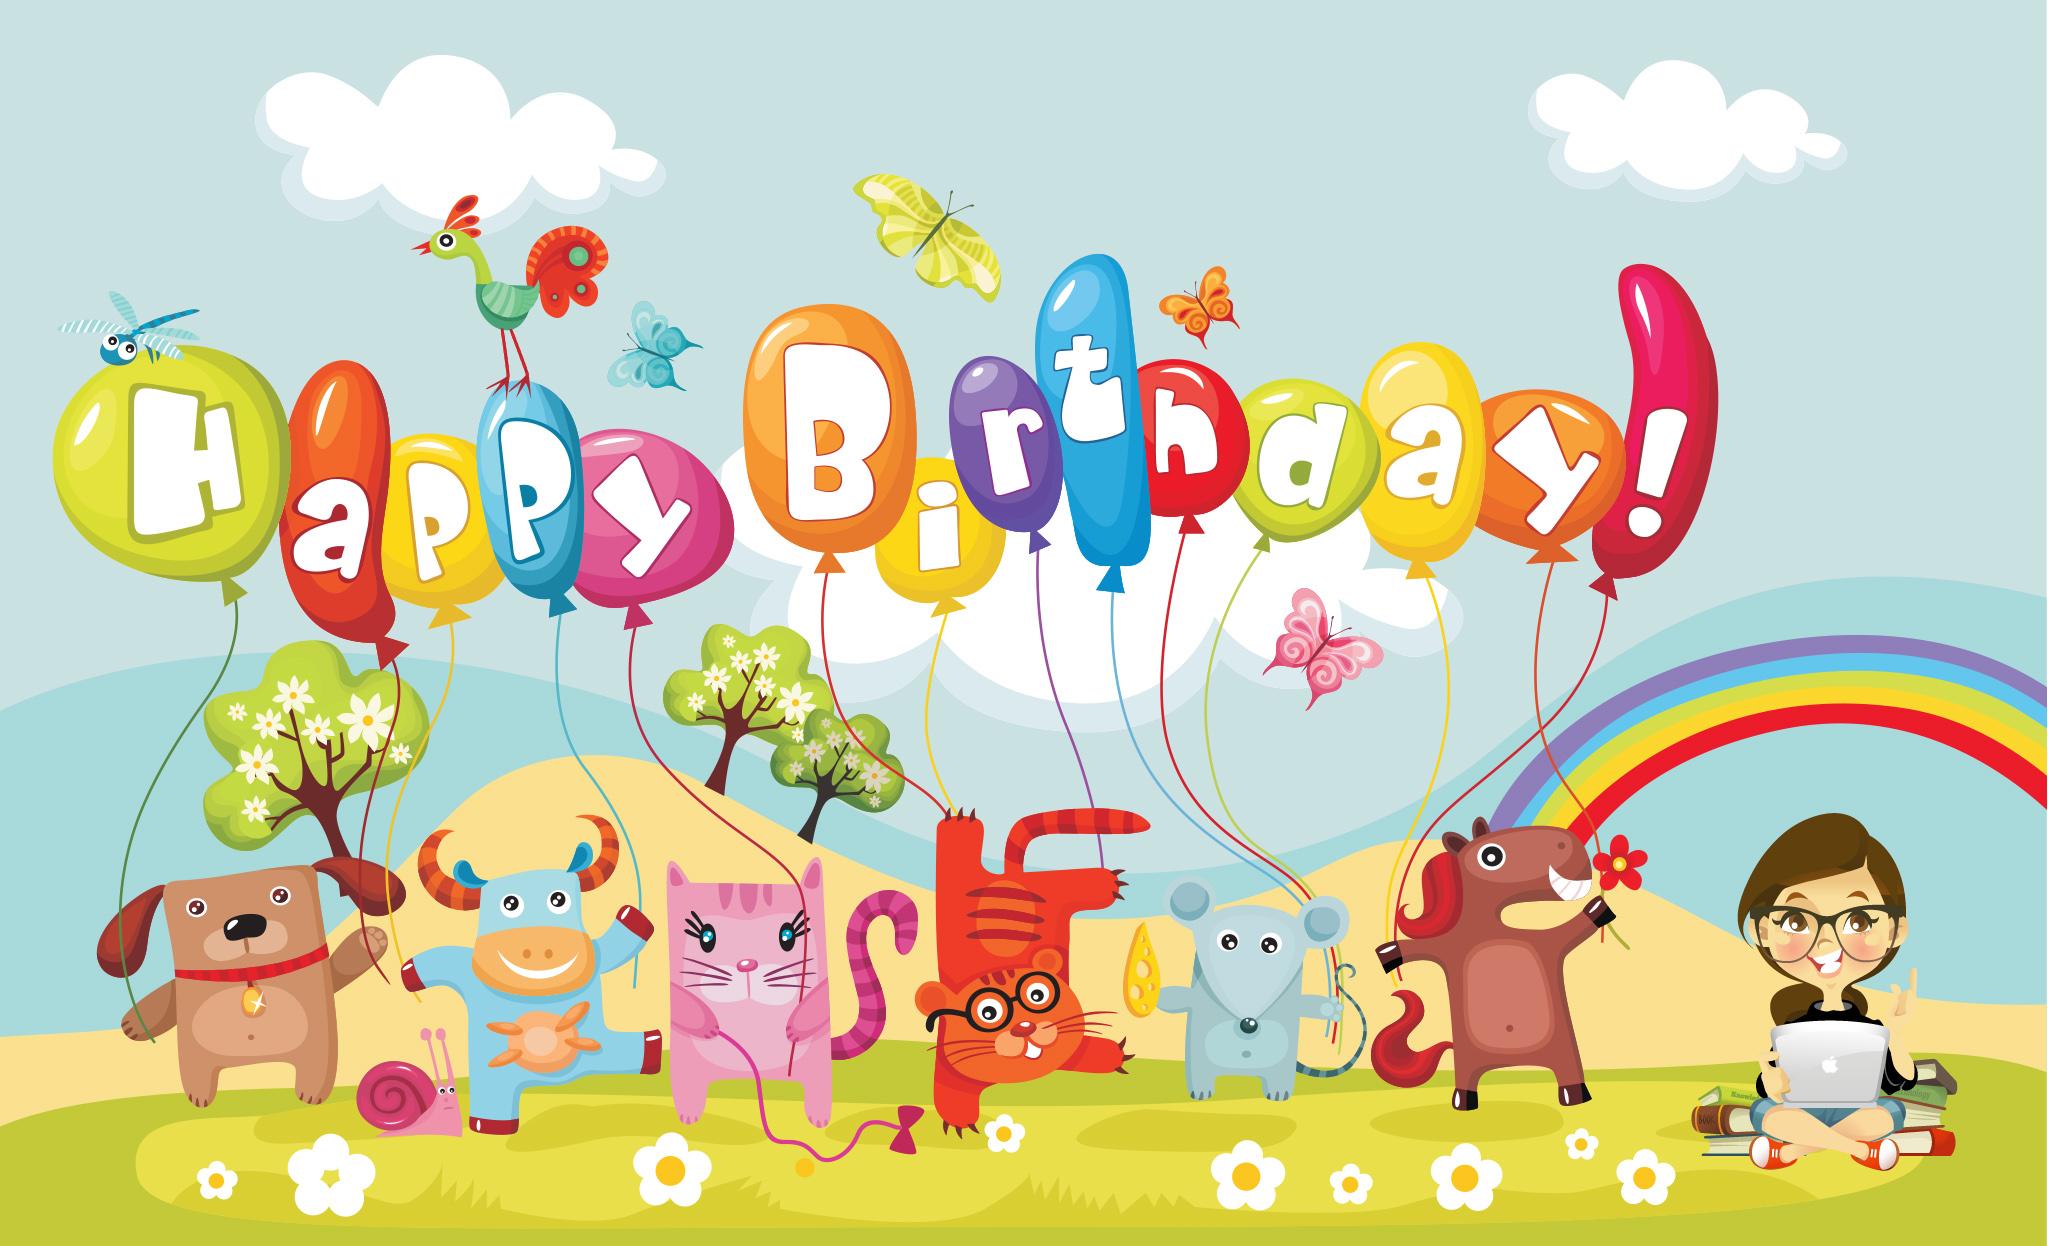 Gambar Kartun Lucu Ucapan Selamat Ulang Tahun Komicbox